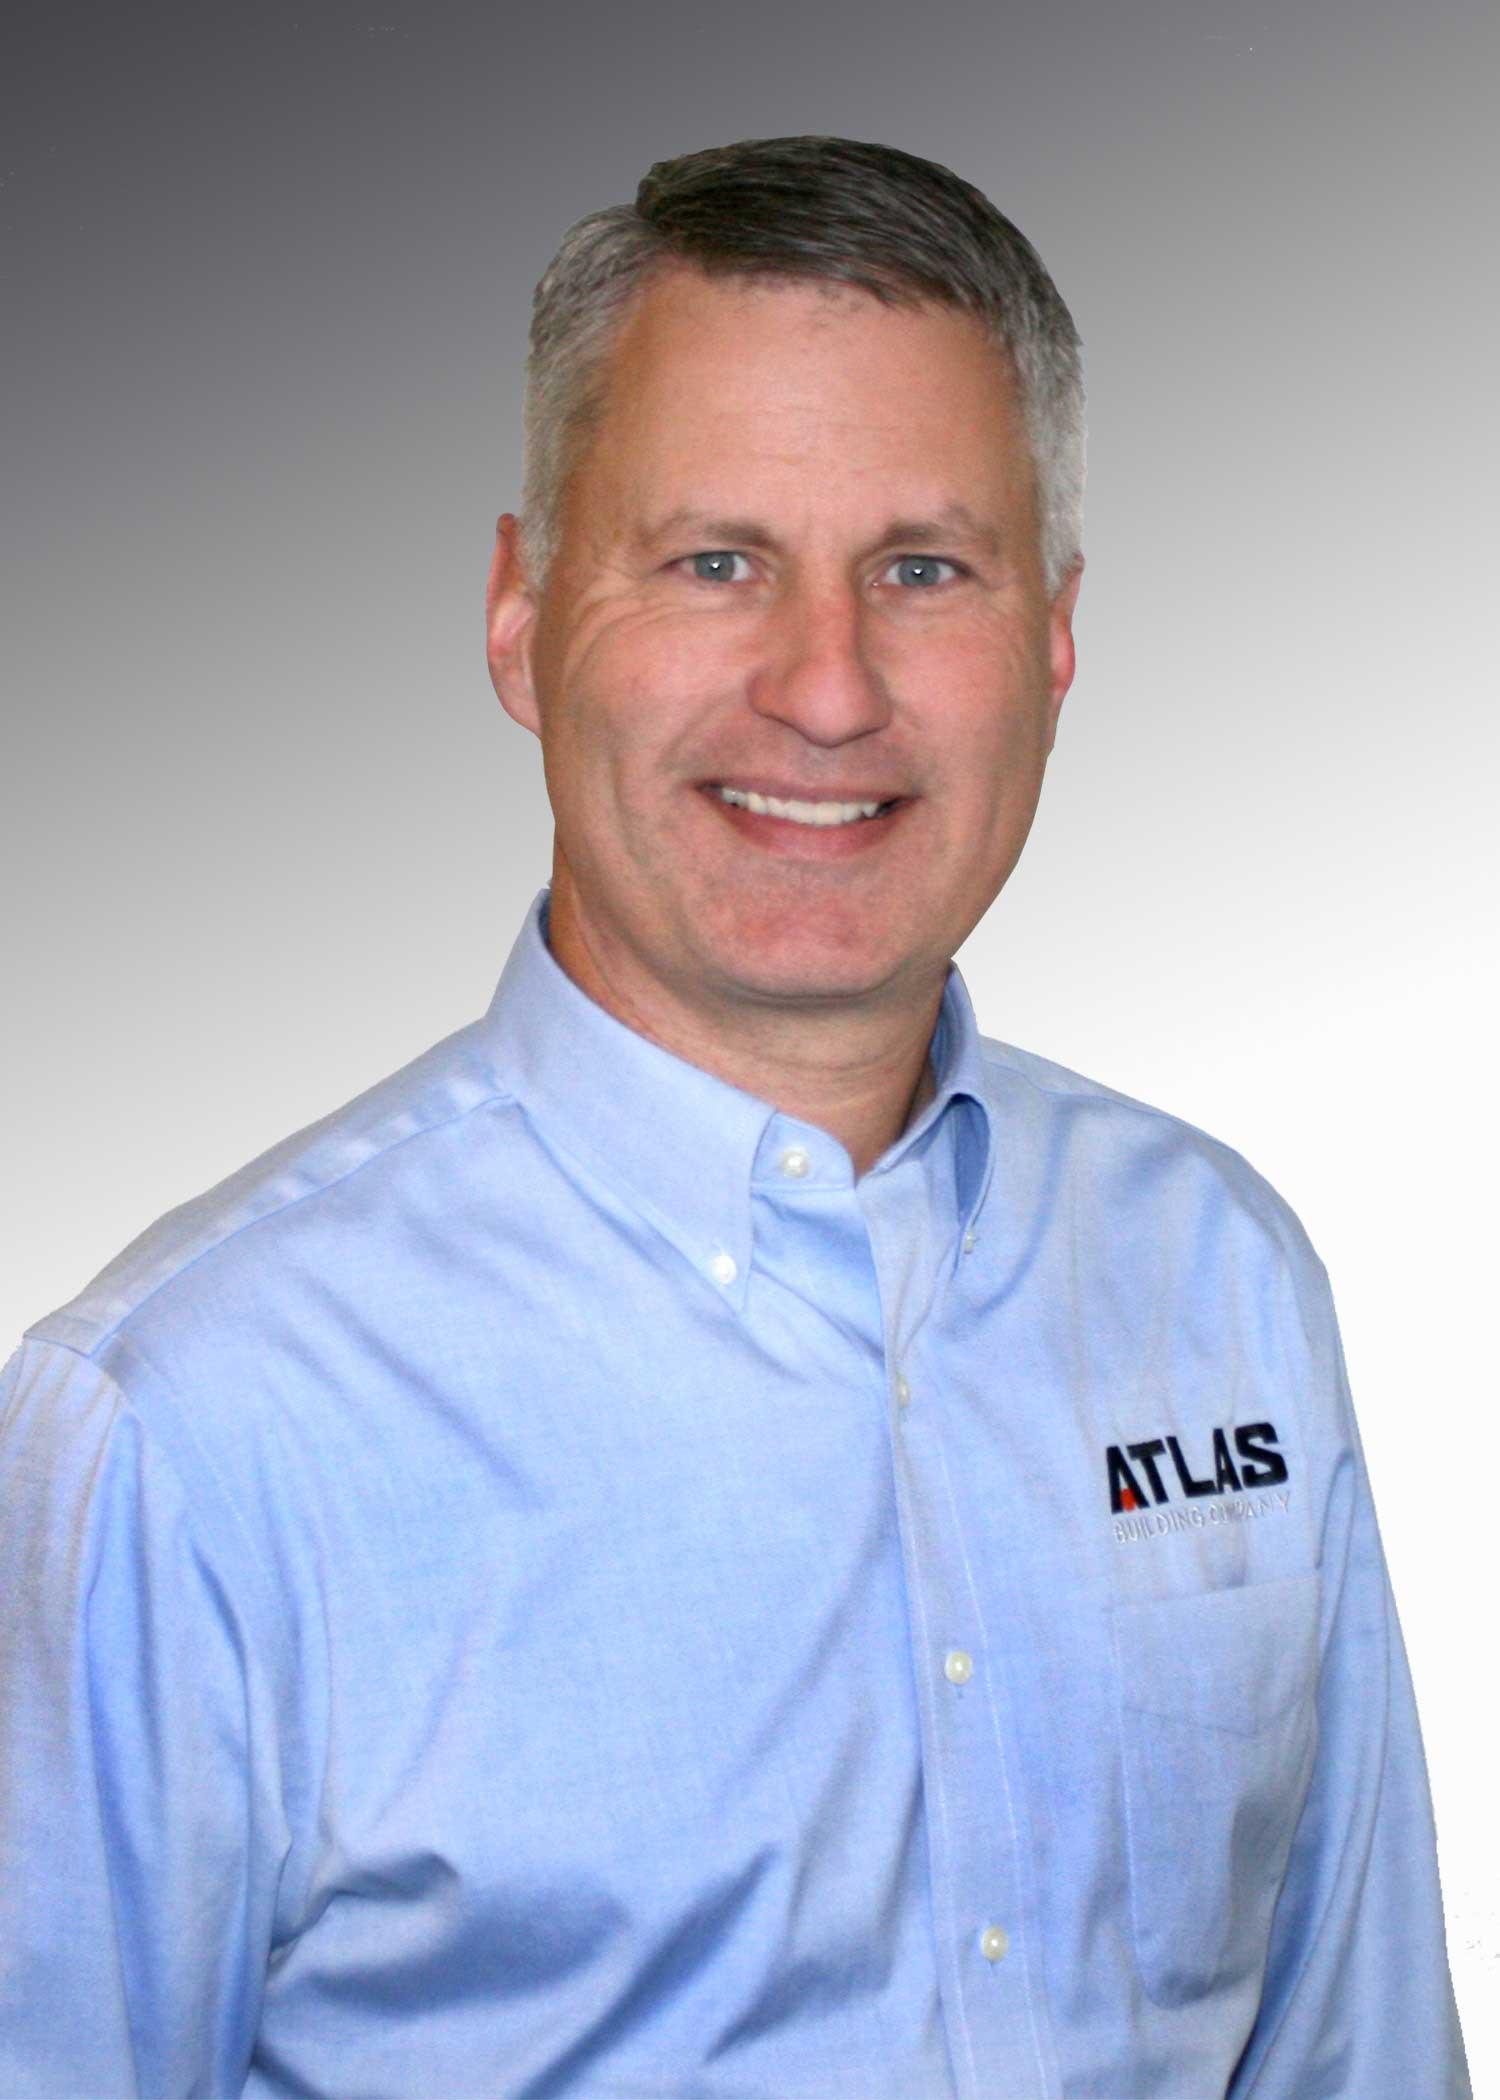 Andy Stultz